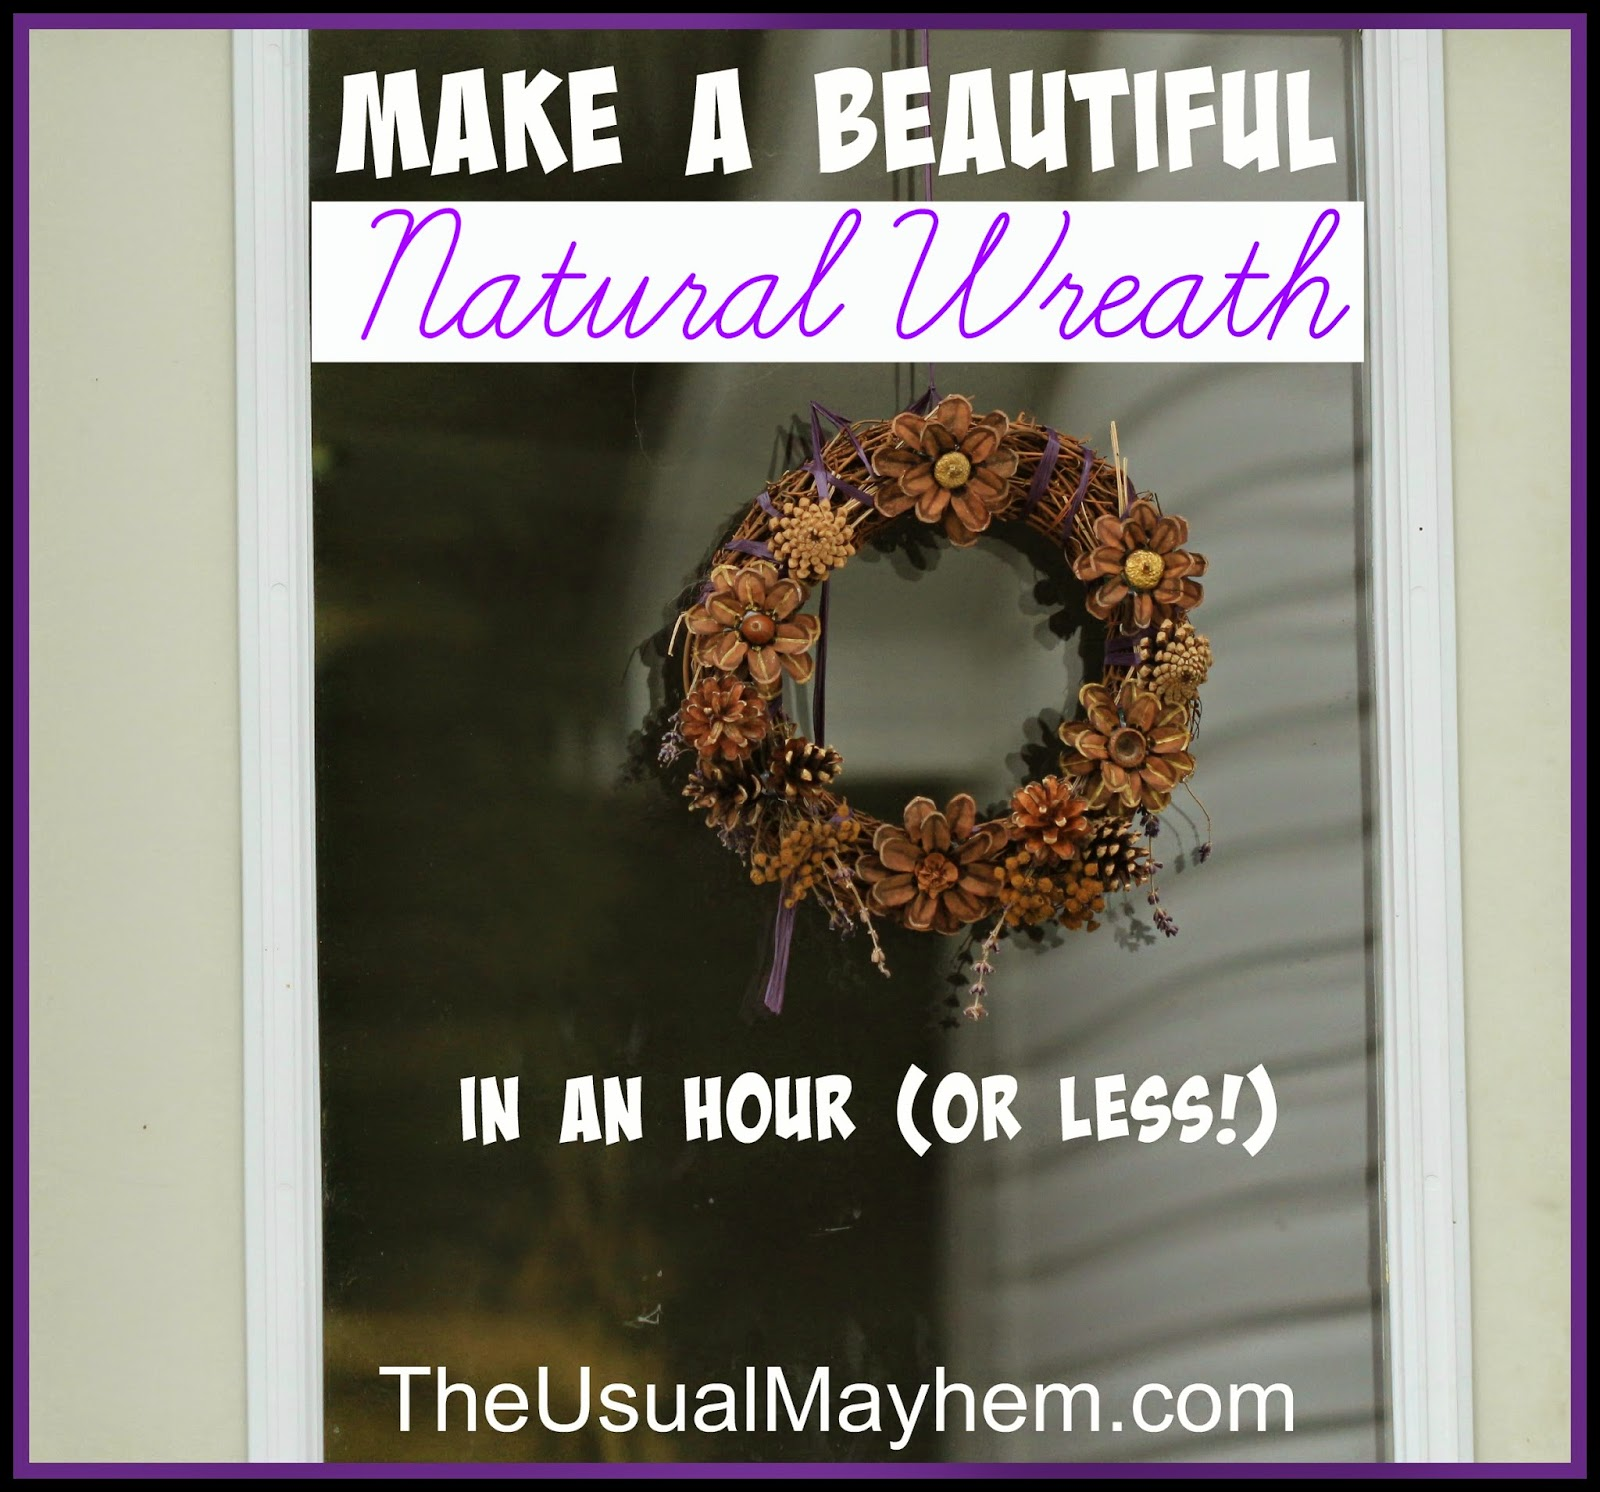 make a beautiful natural wreath